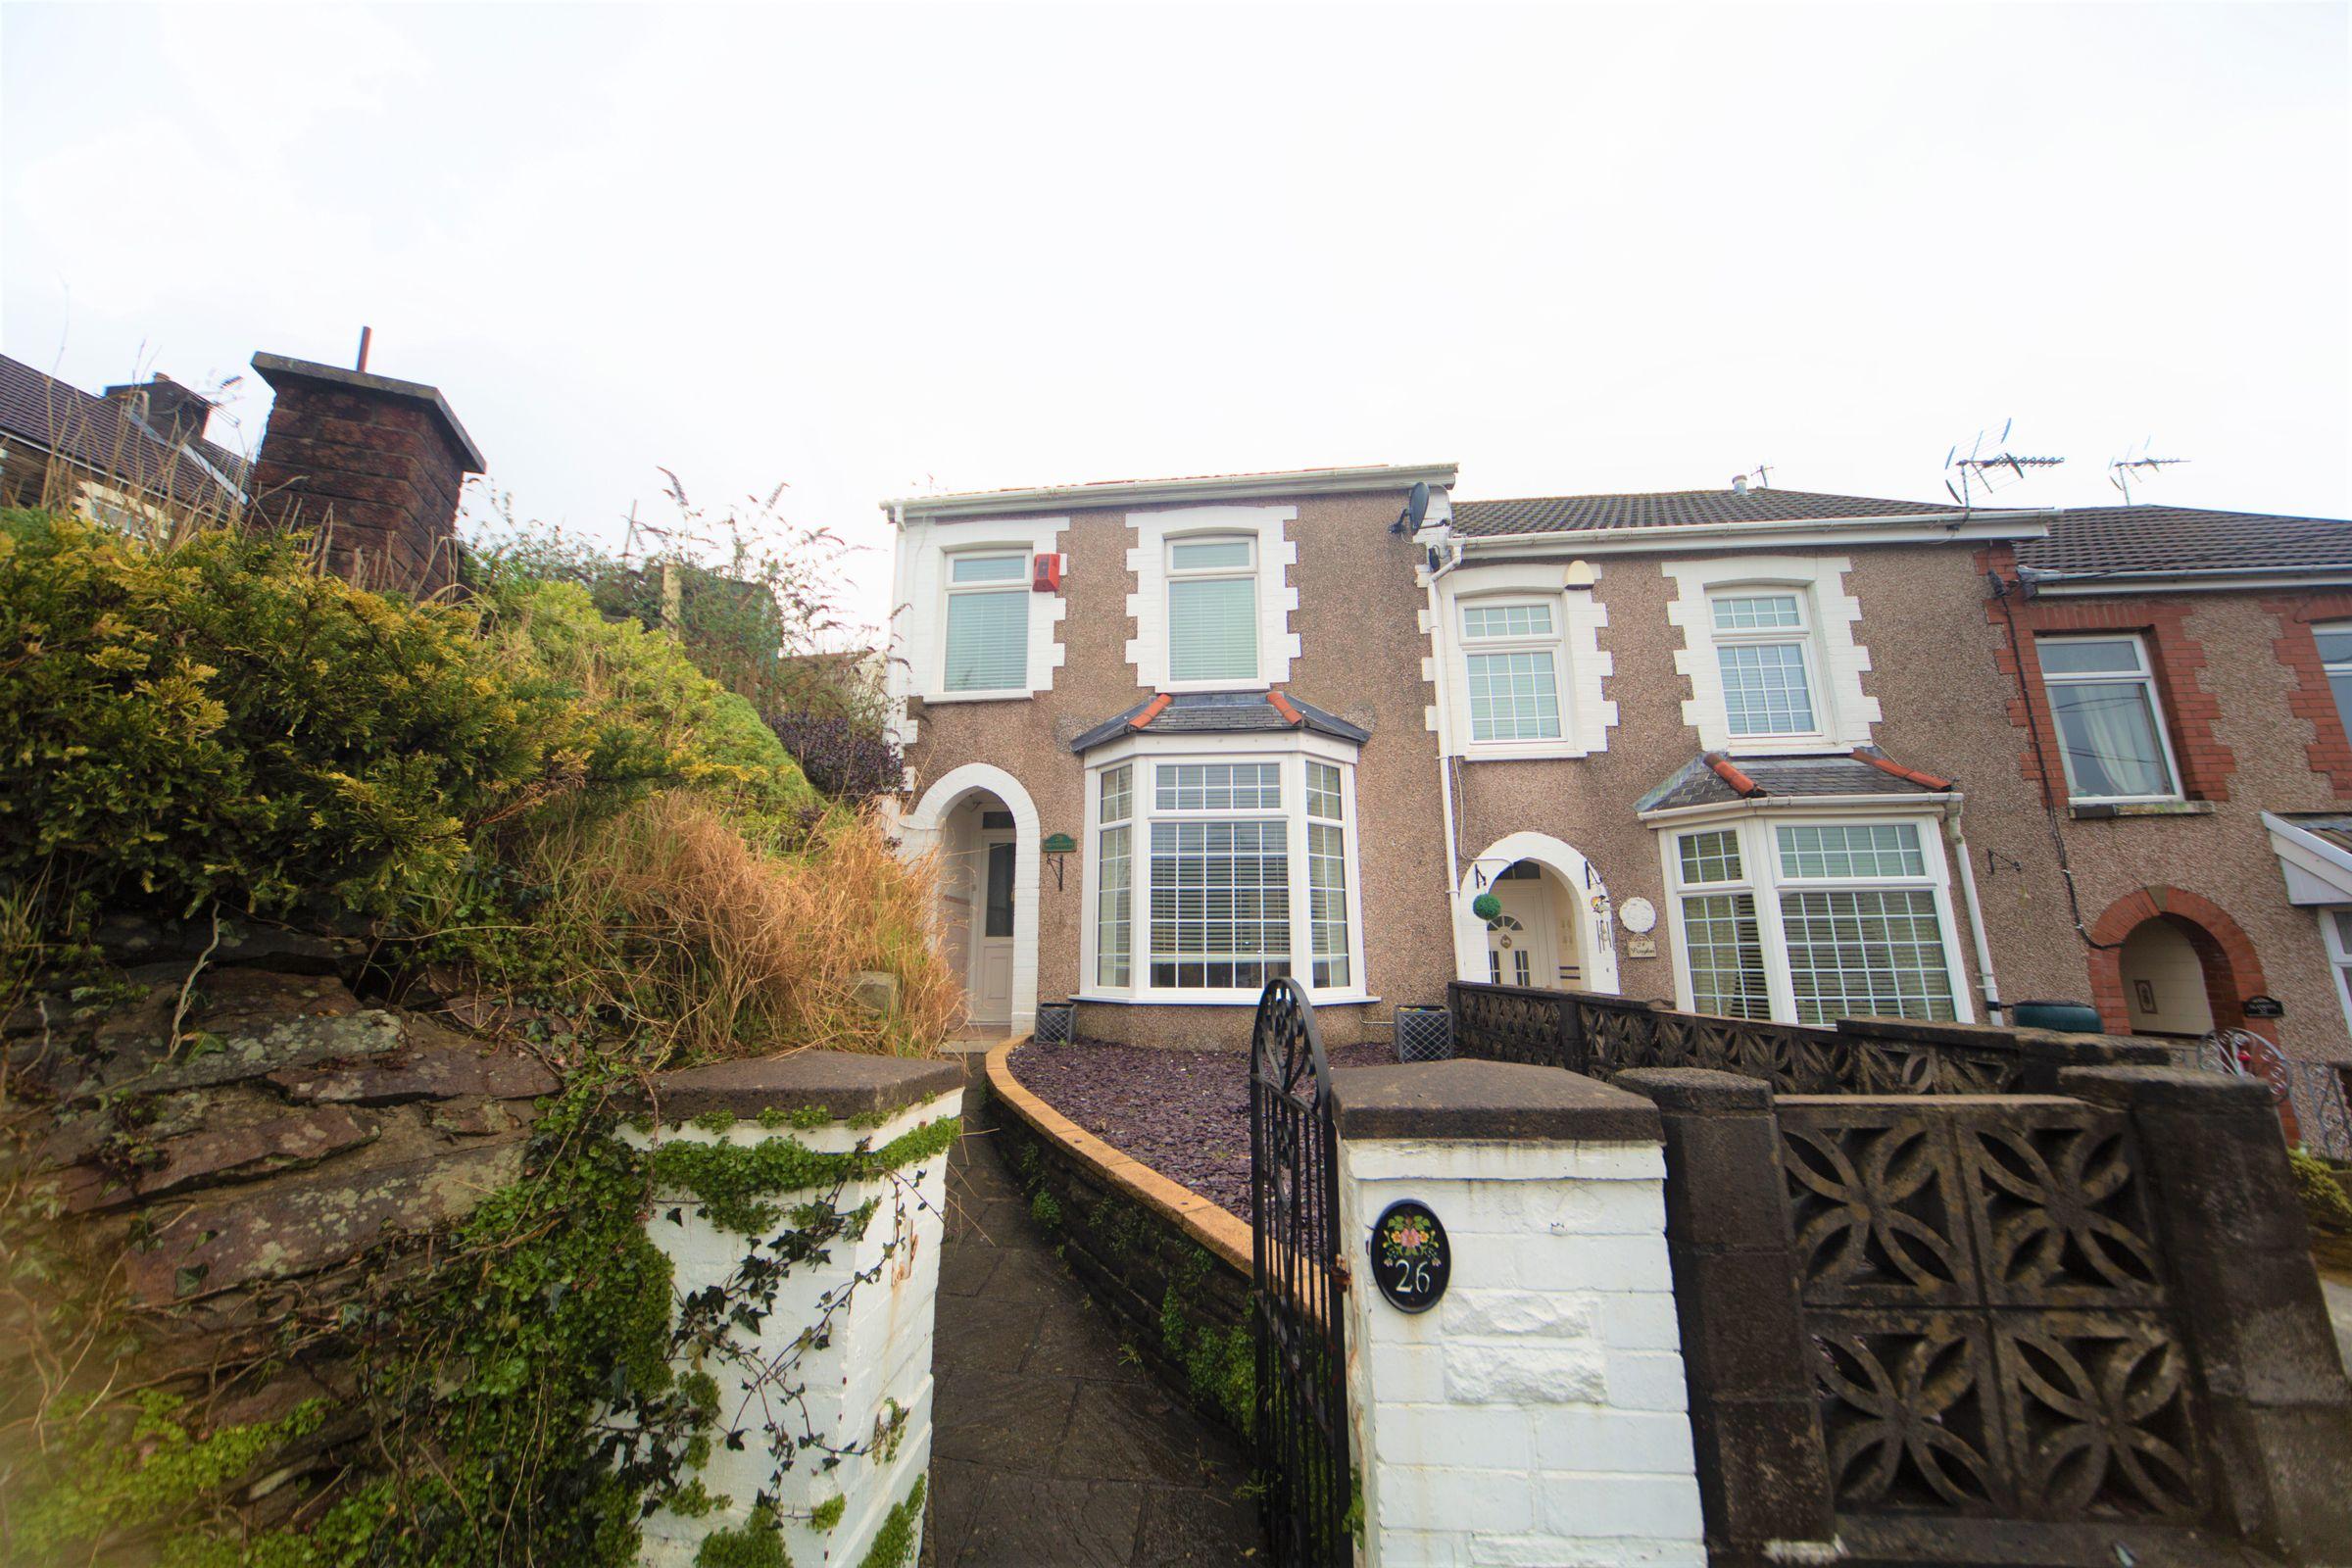 Property photo 1 of 22.